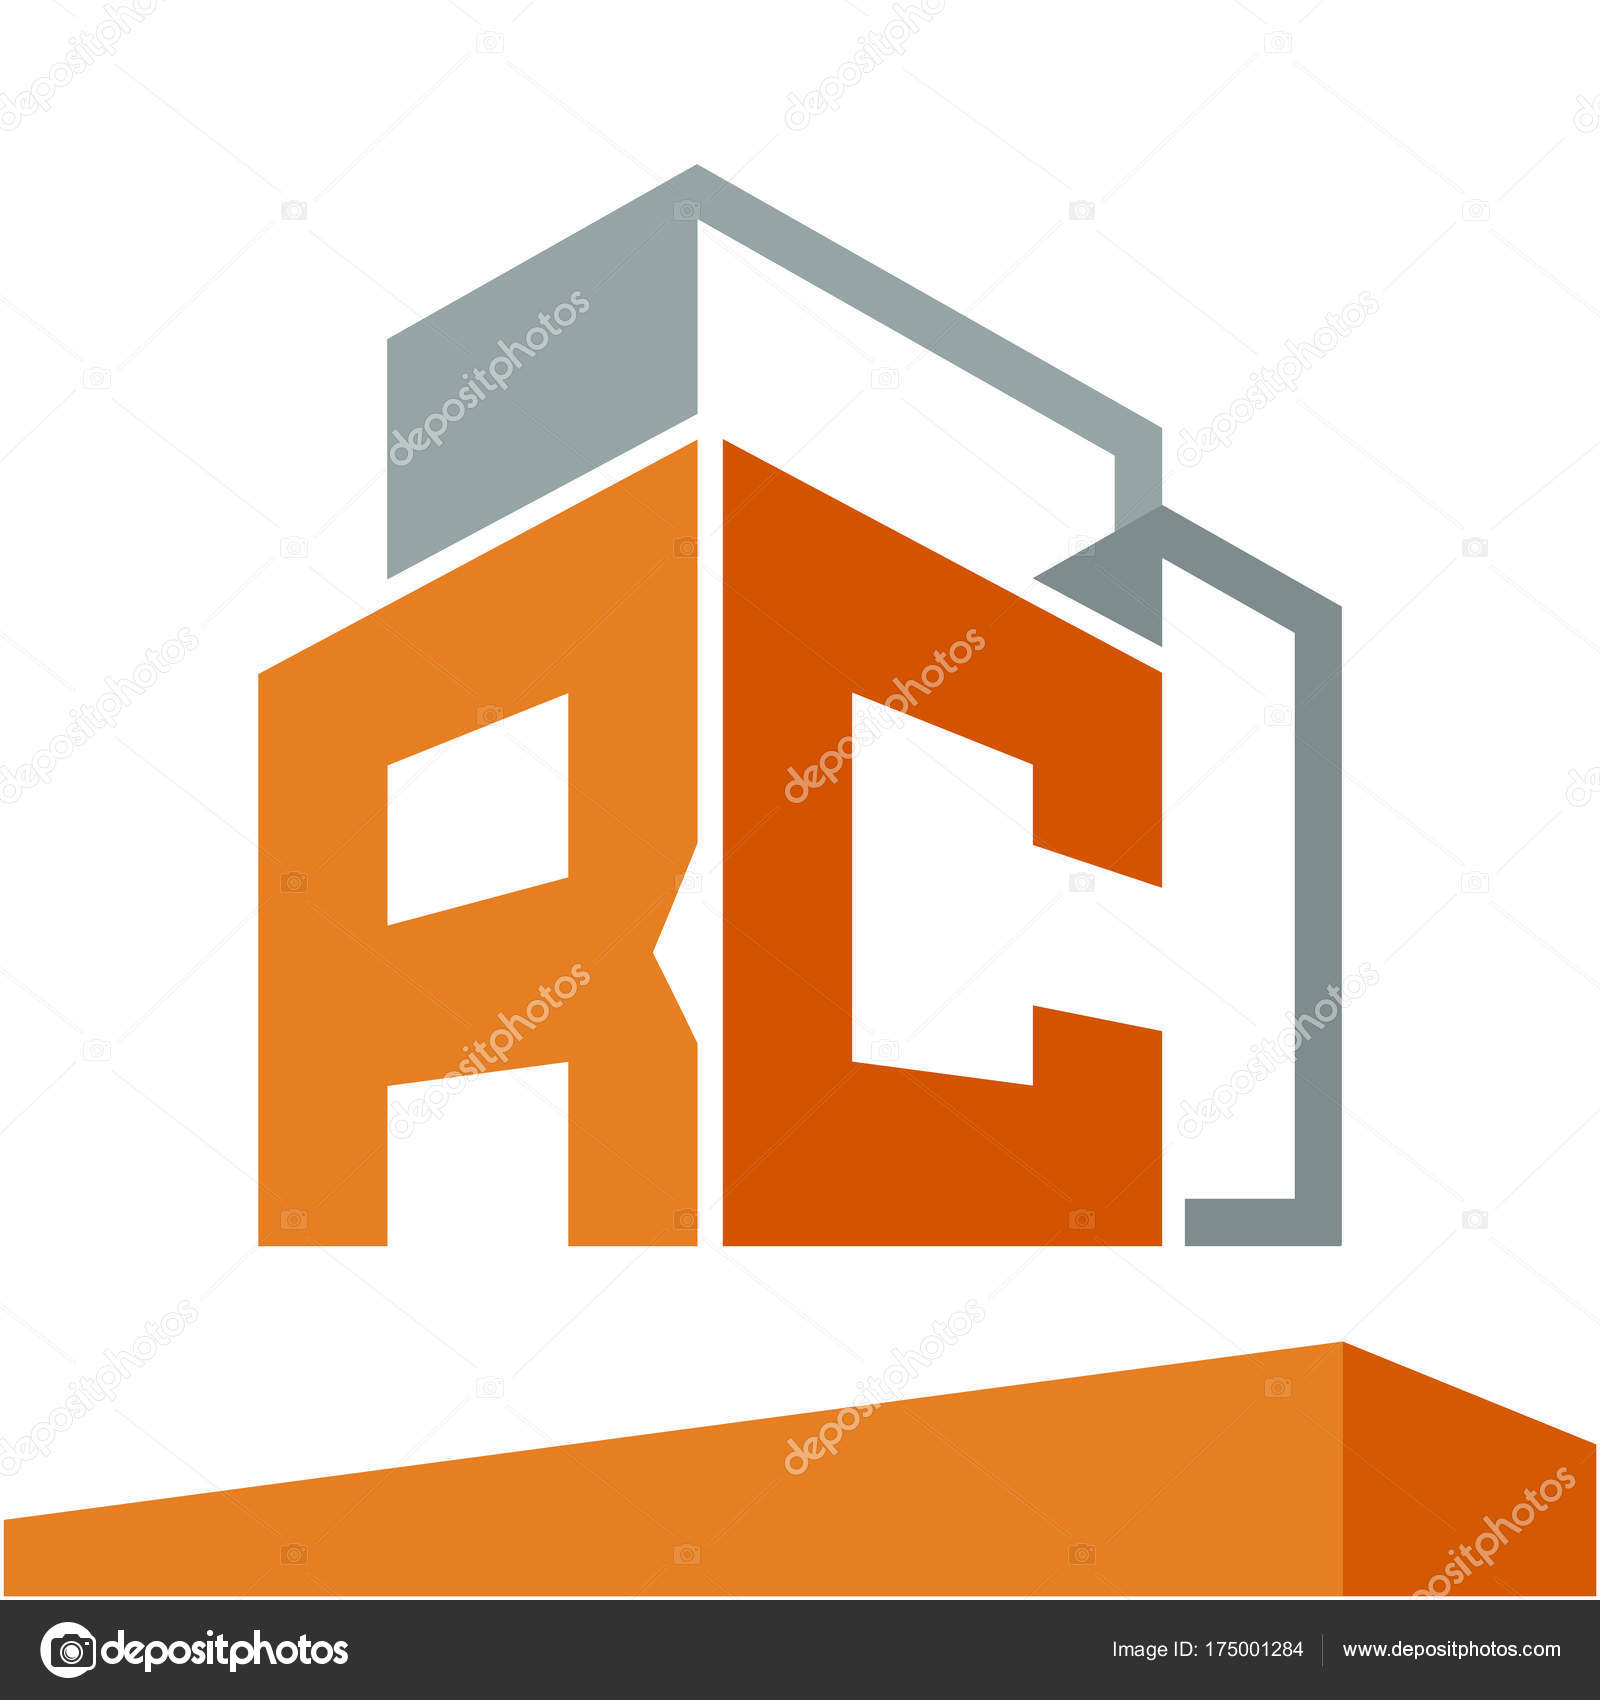 Icon Logo Initial Business Development Construction Services Combination Letters Stock Vector C Adresiastock 175001284,Creative Graphic Designer Resume Pdf